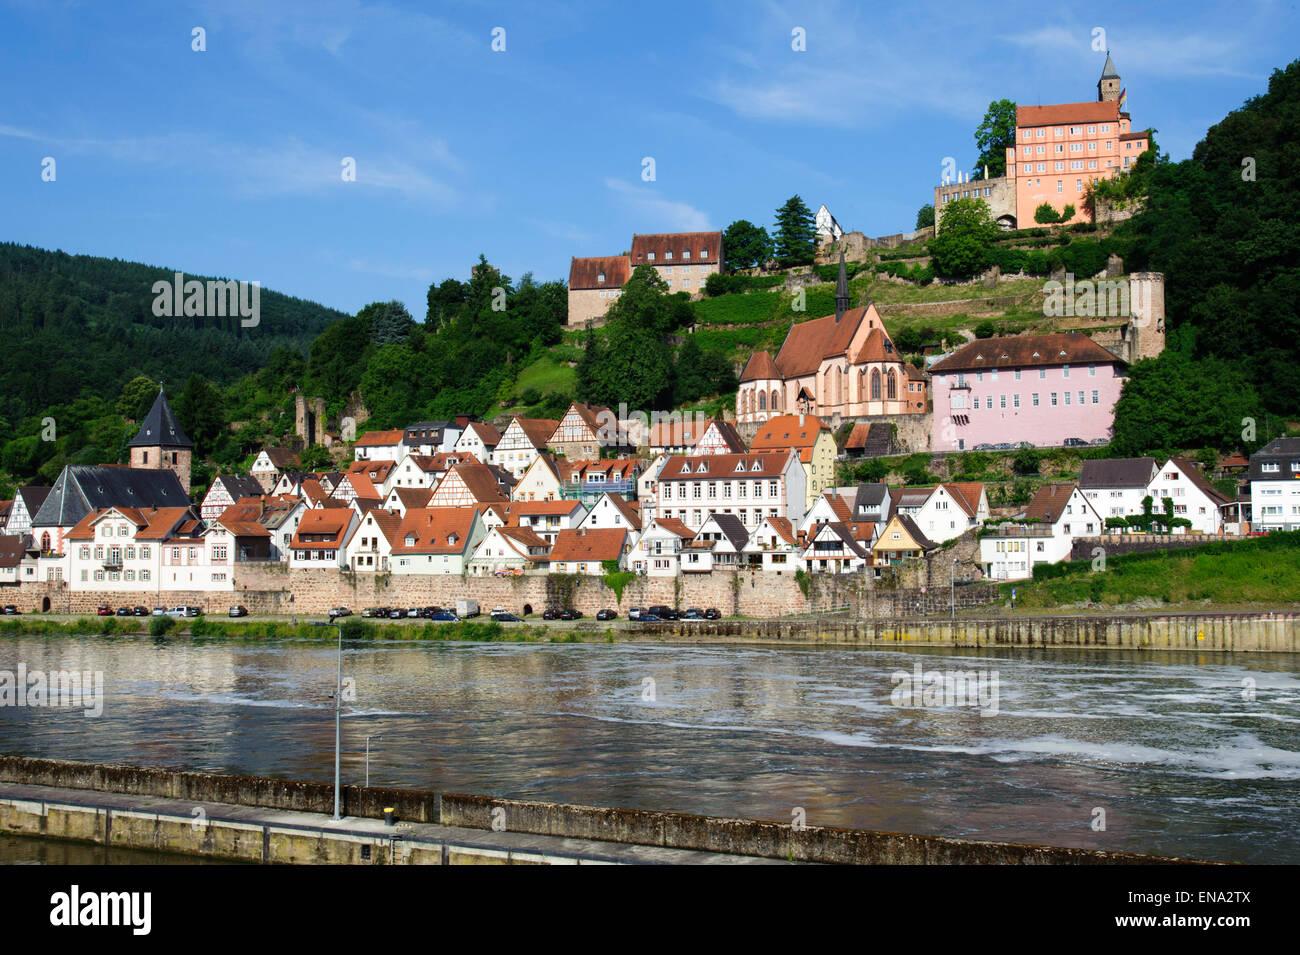 Old Town And Castle Hirschhorn Neckar Hessen Germany Stock - Hessen germany